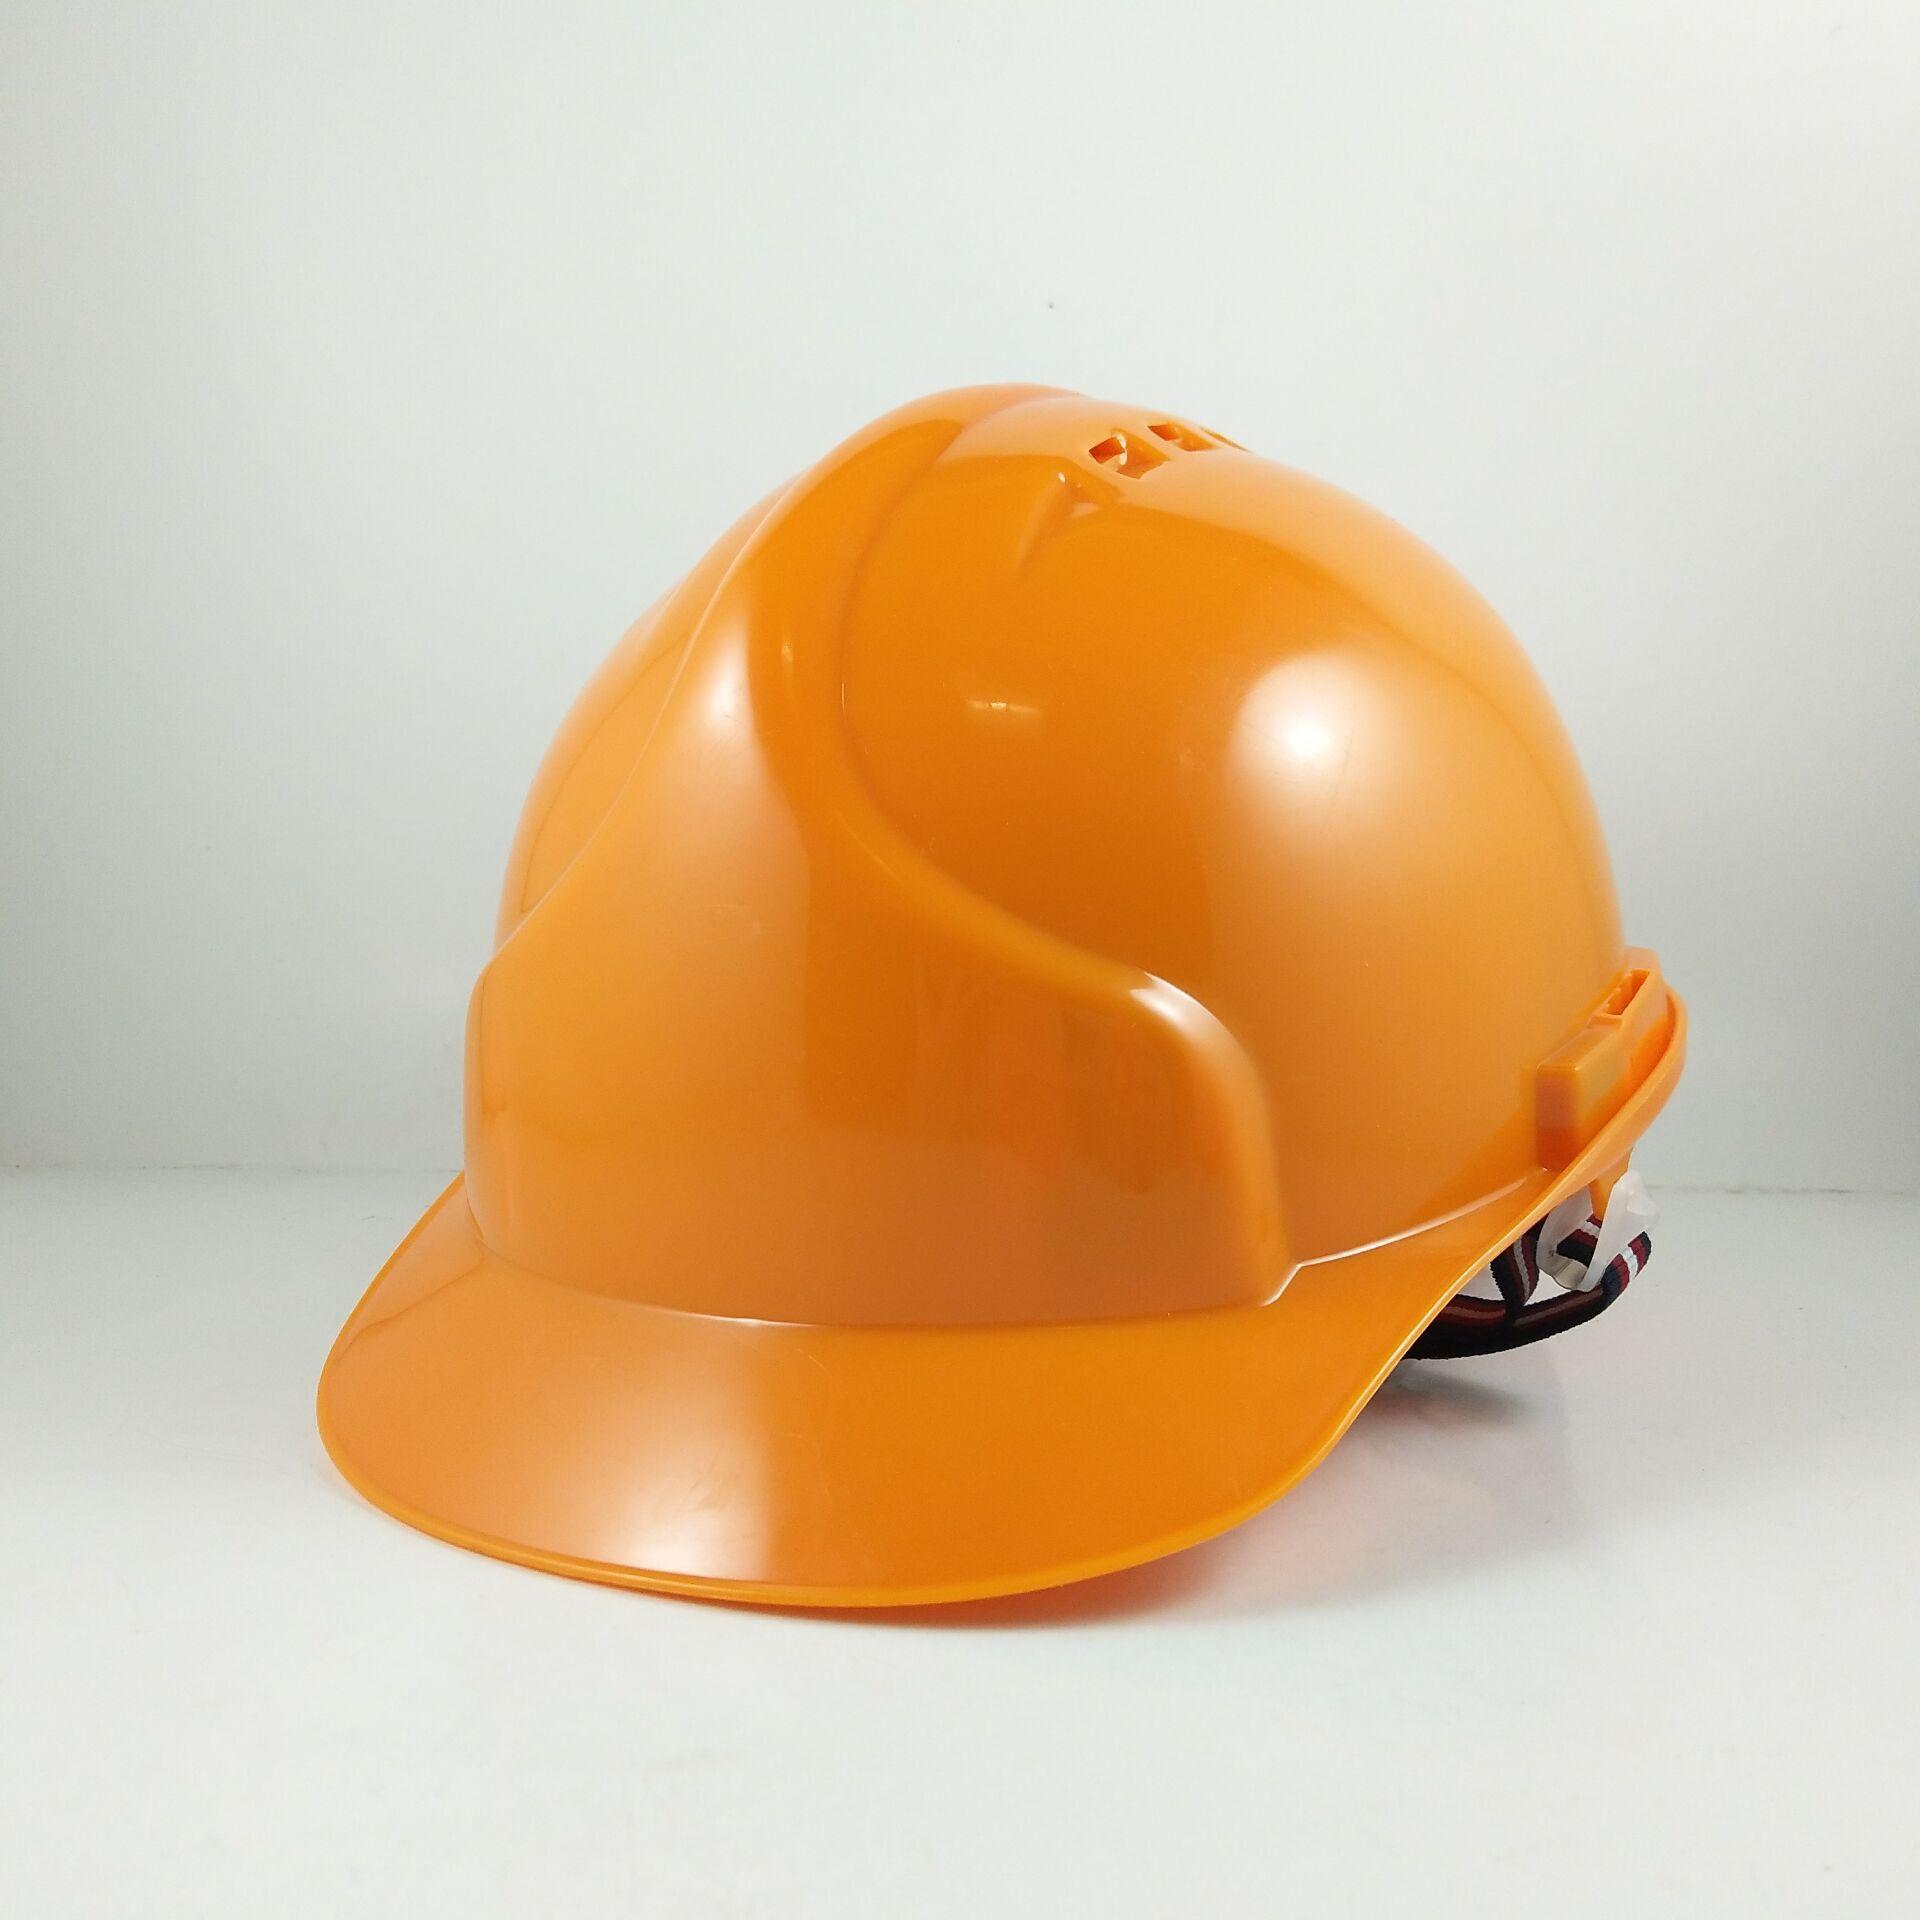 Manufacturers 9999 Work Site Protective Cap Plastic Helmet PE Safety Helmet Sun Hat Customizable Engineering Use Hat Architectur